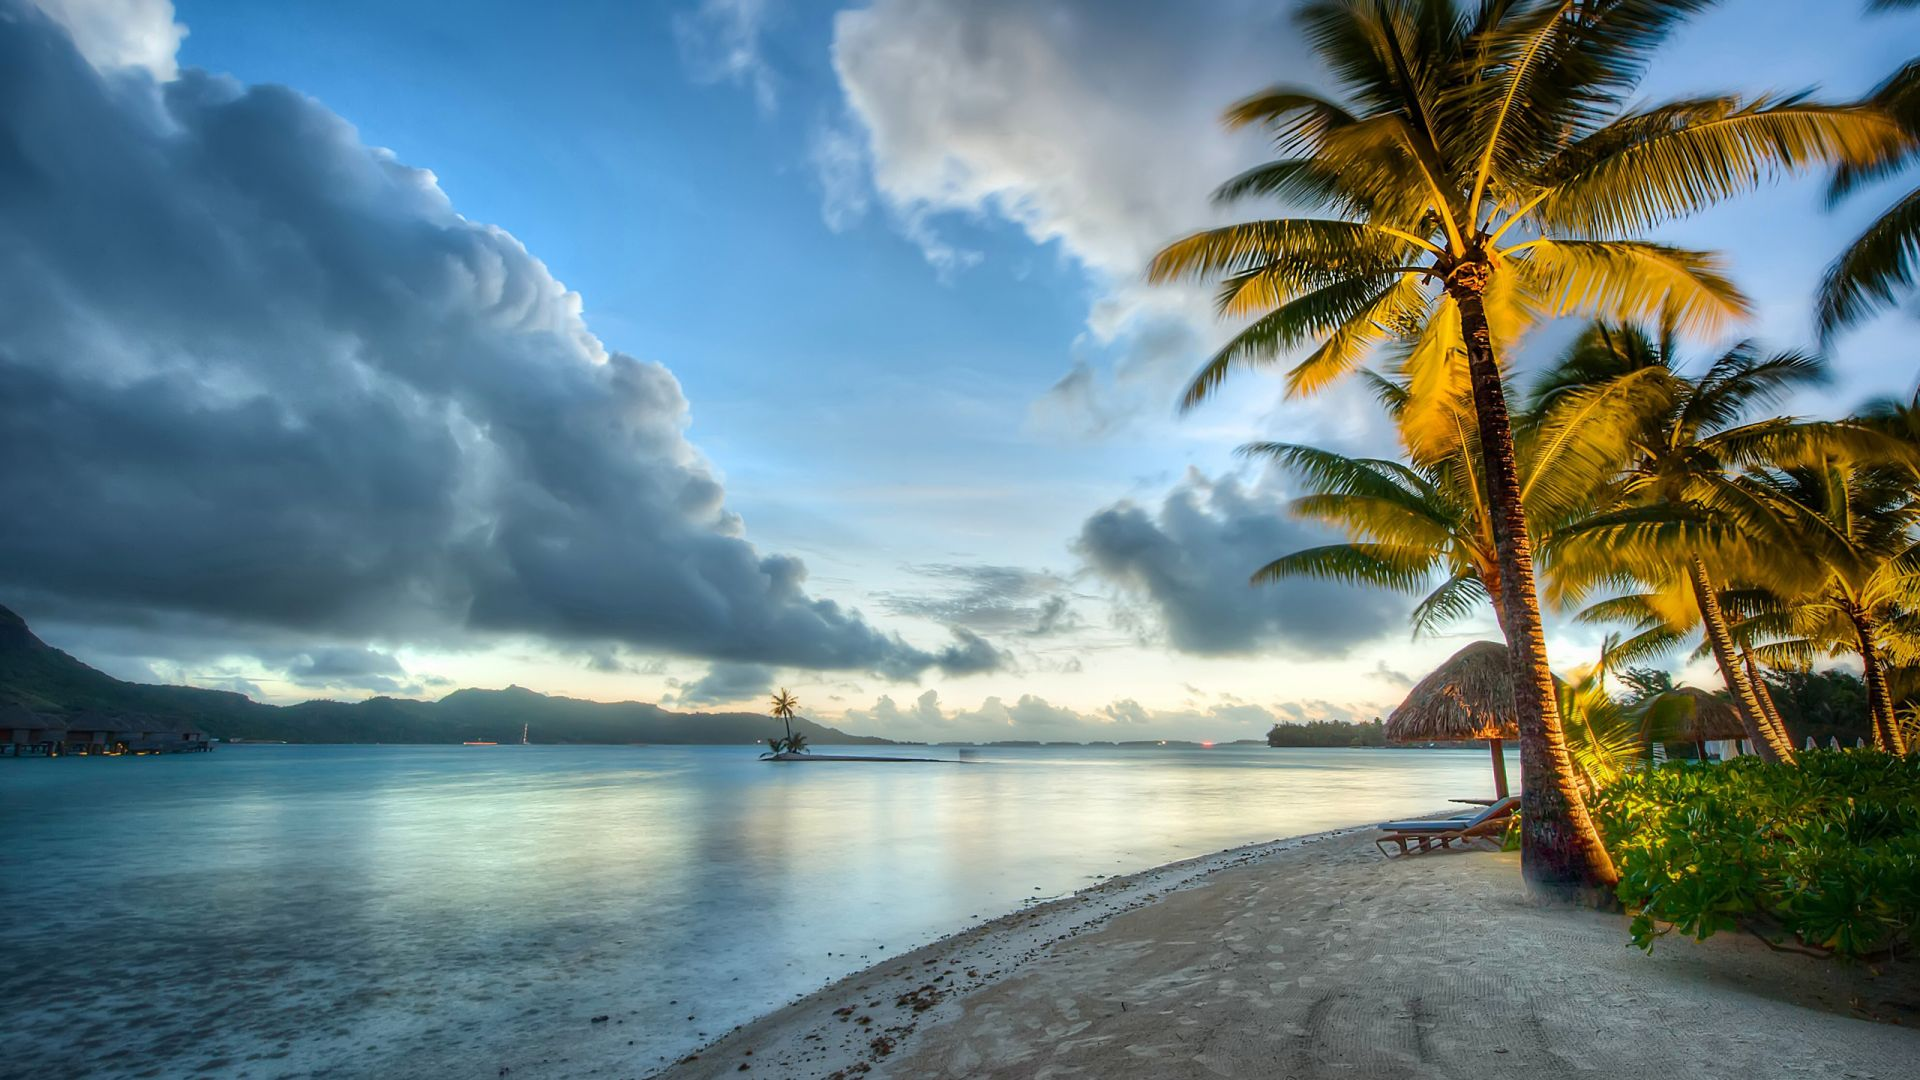 Wallpaper Coast, ocean, sea, scenery, palm tree